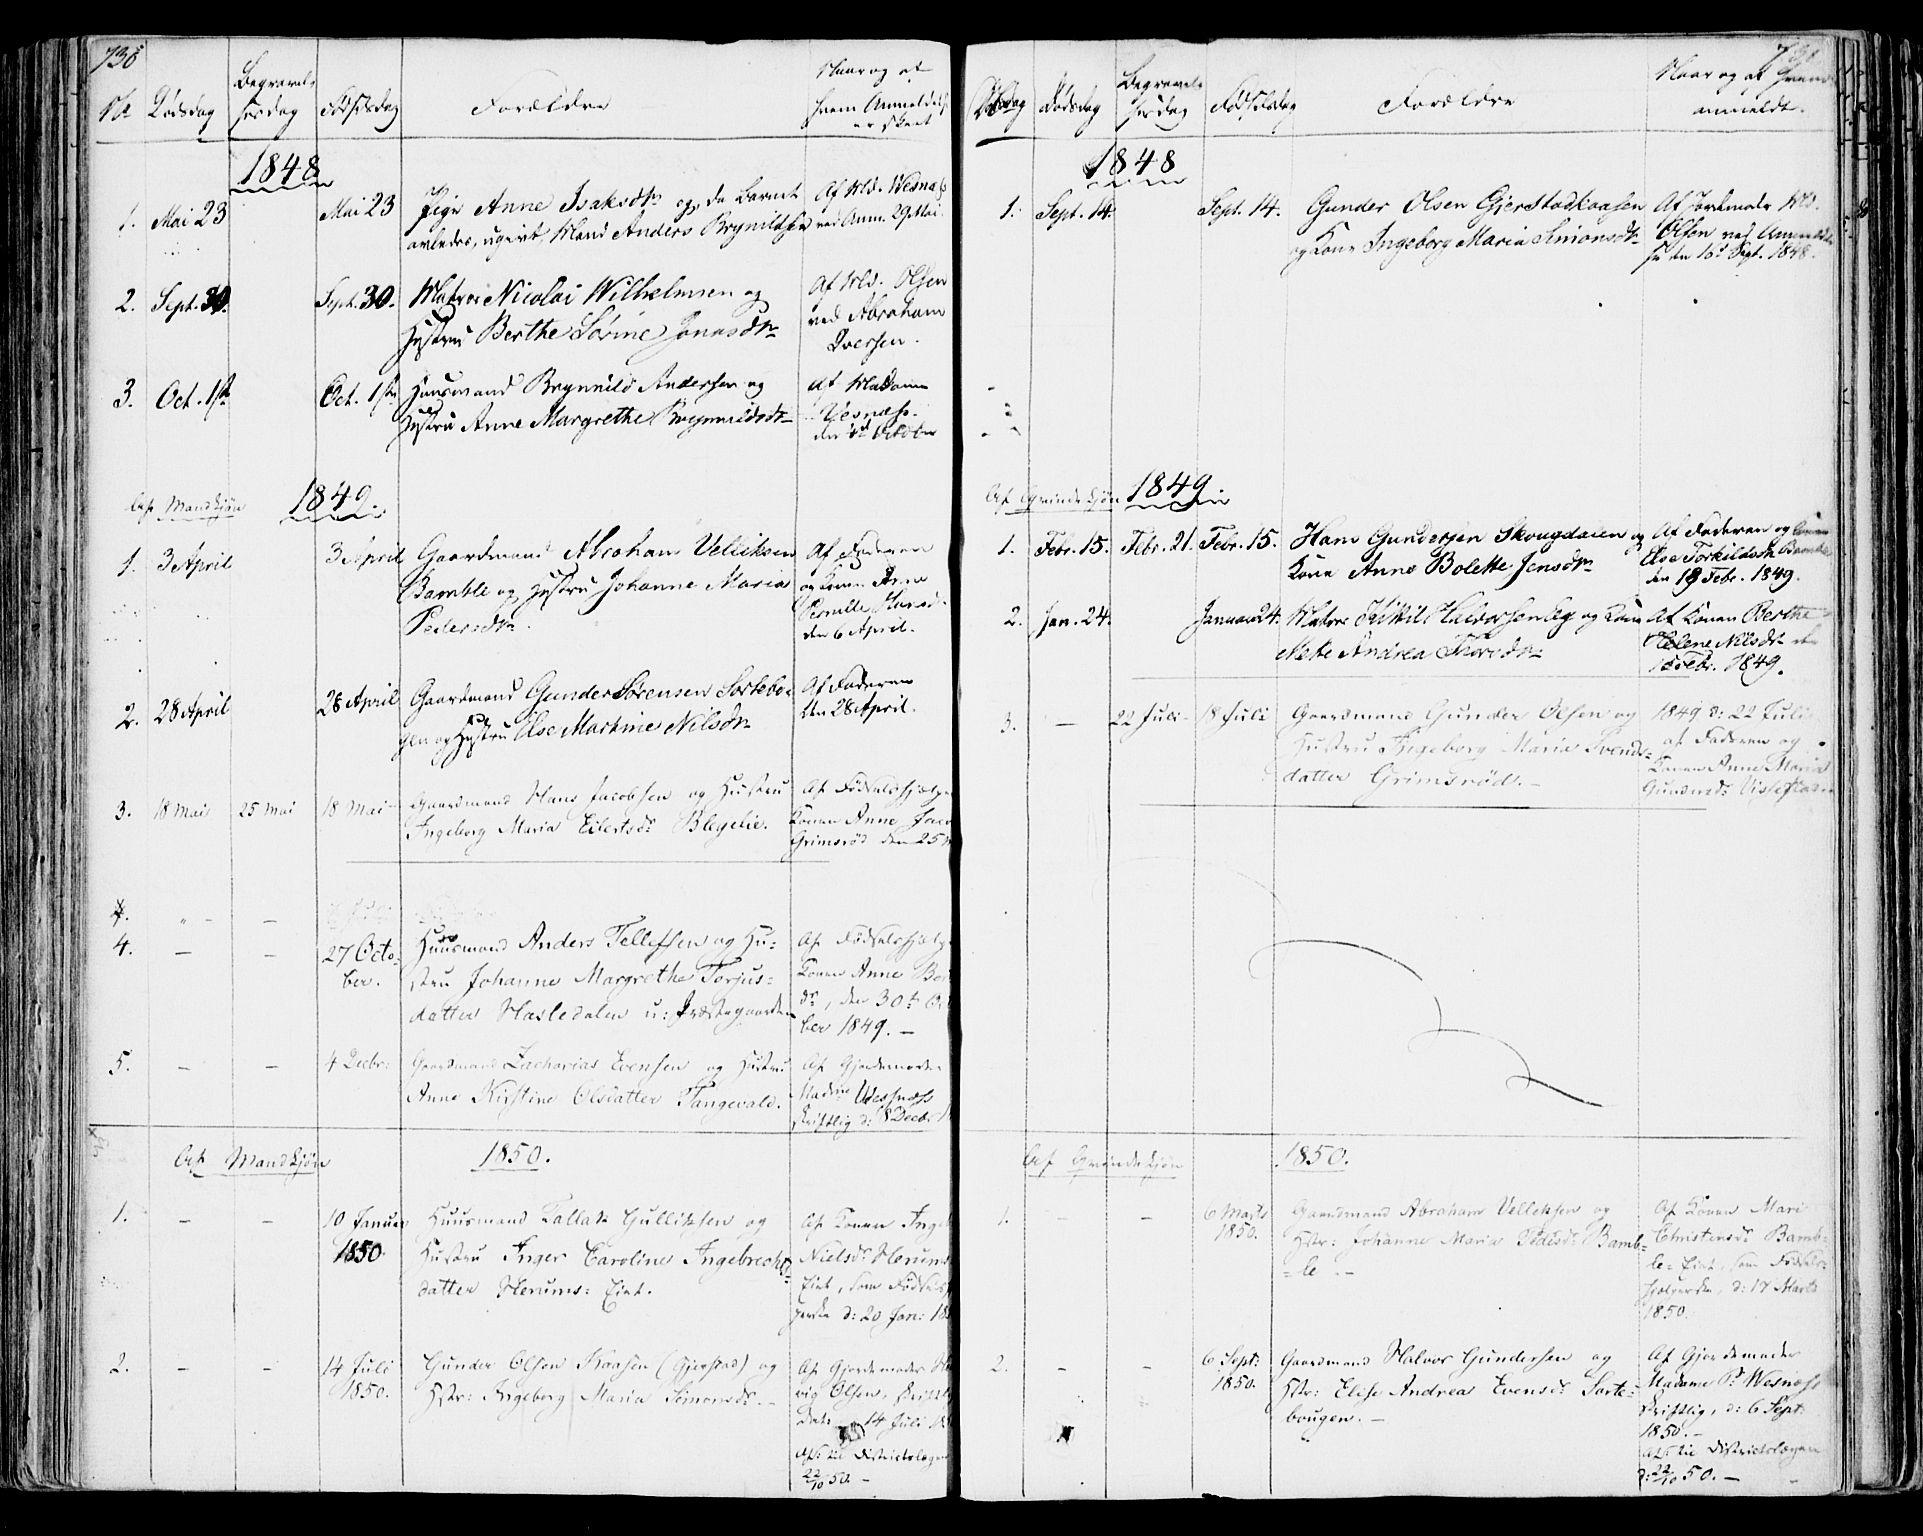 SAKO, Bamble kirkebøker, F/Fa/L0004: Ministerialbok nr. I 4, 1834-1853, s. 730-731